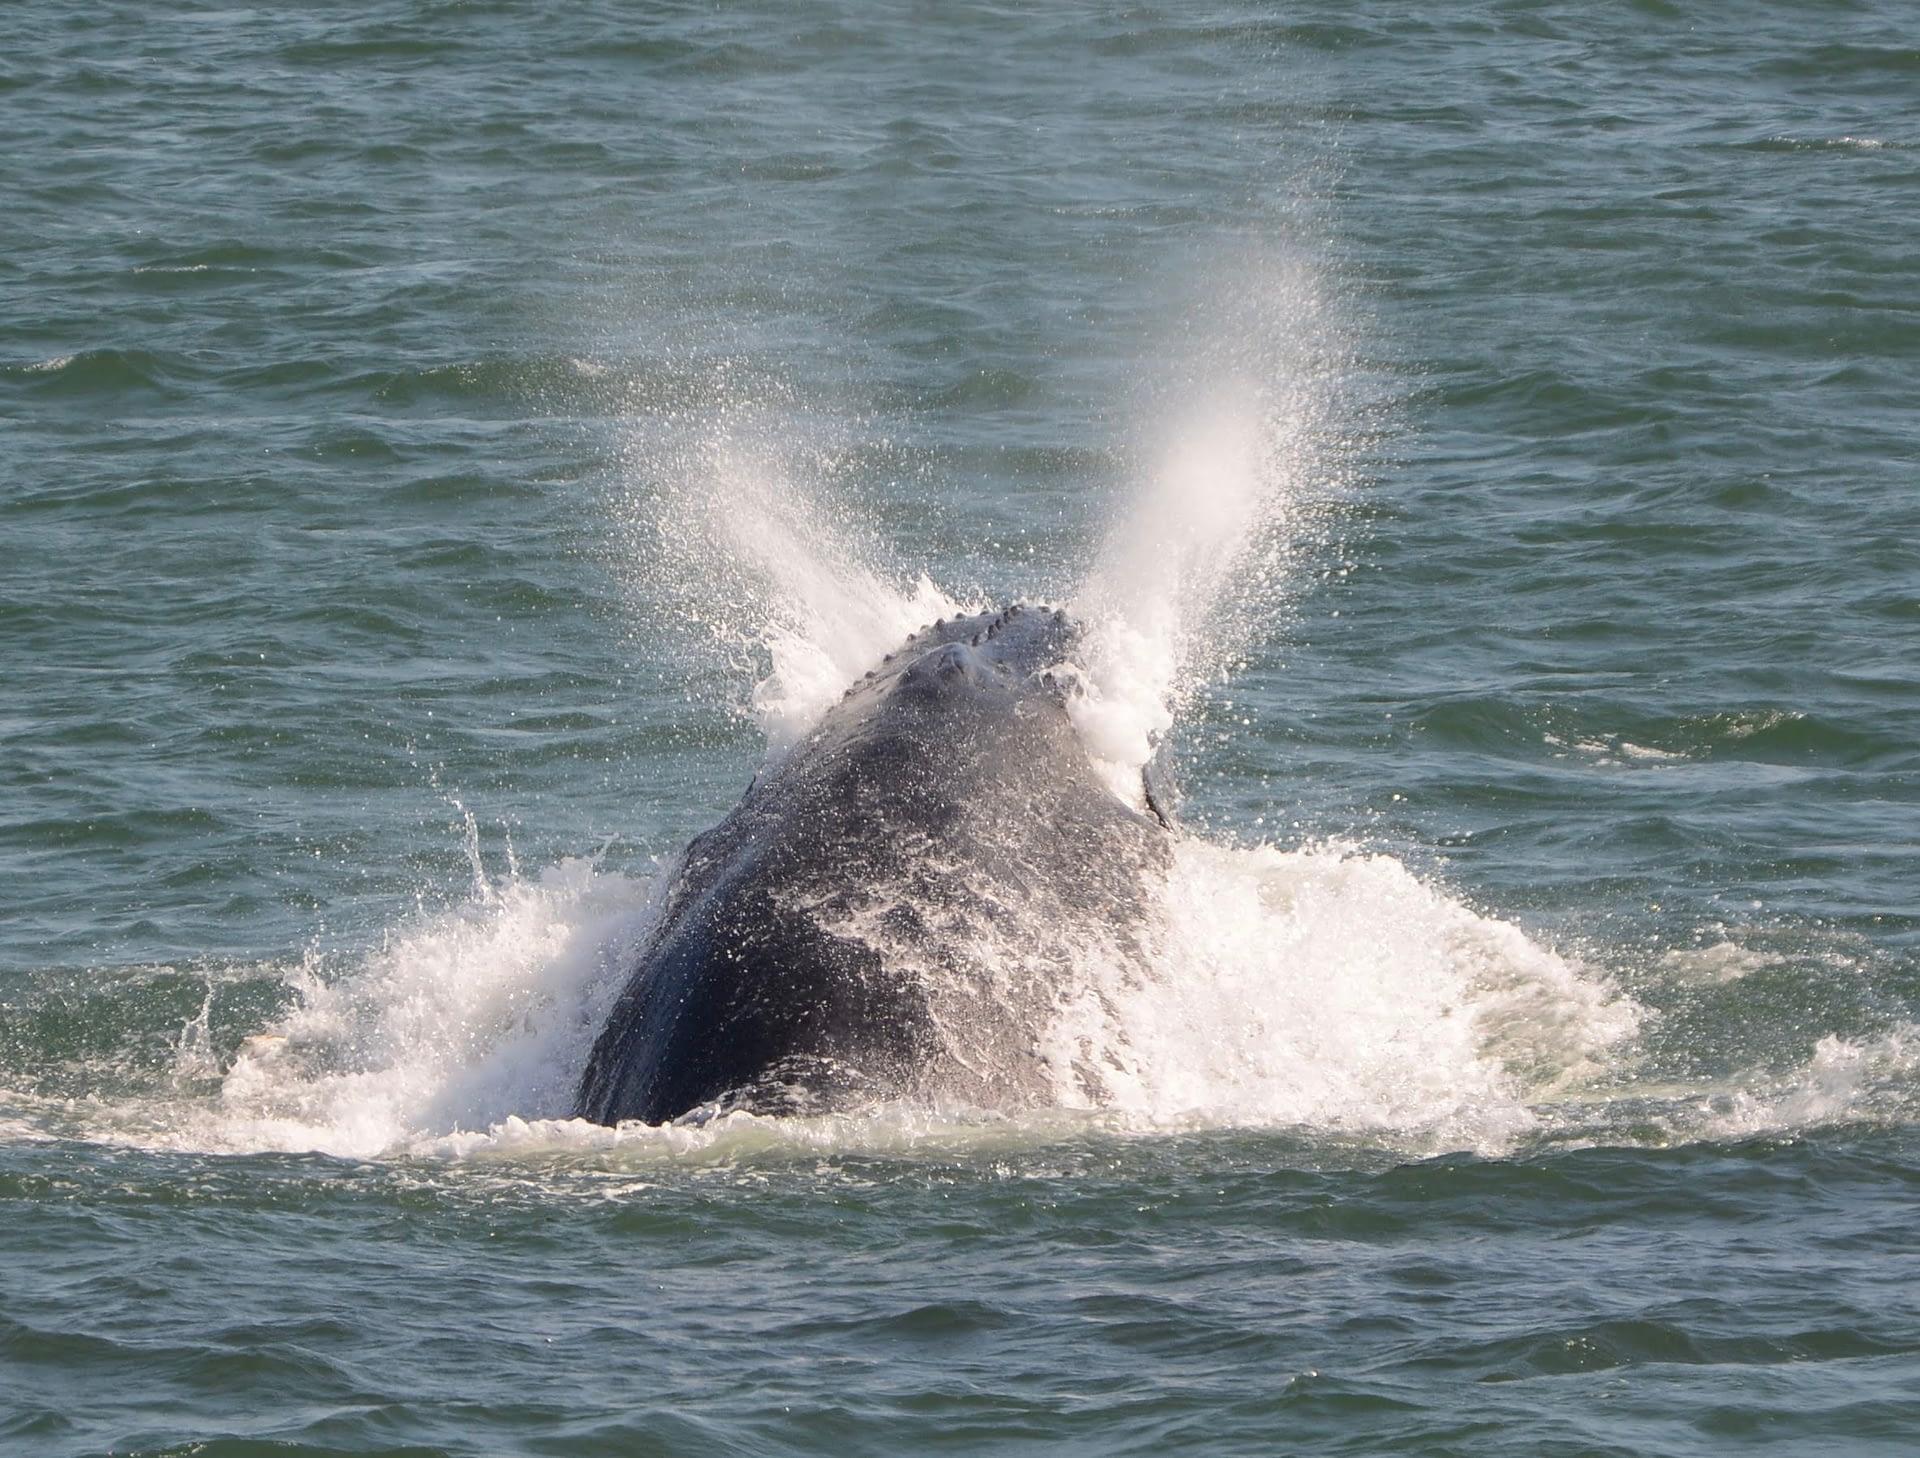 Humpback Whale 16 lunge feeding on bunker